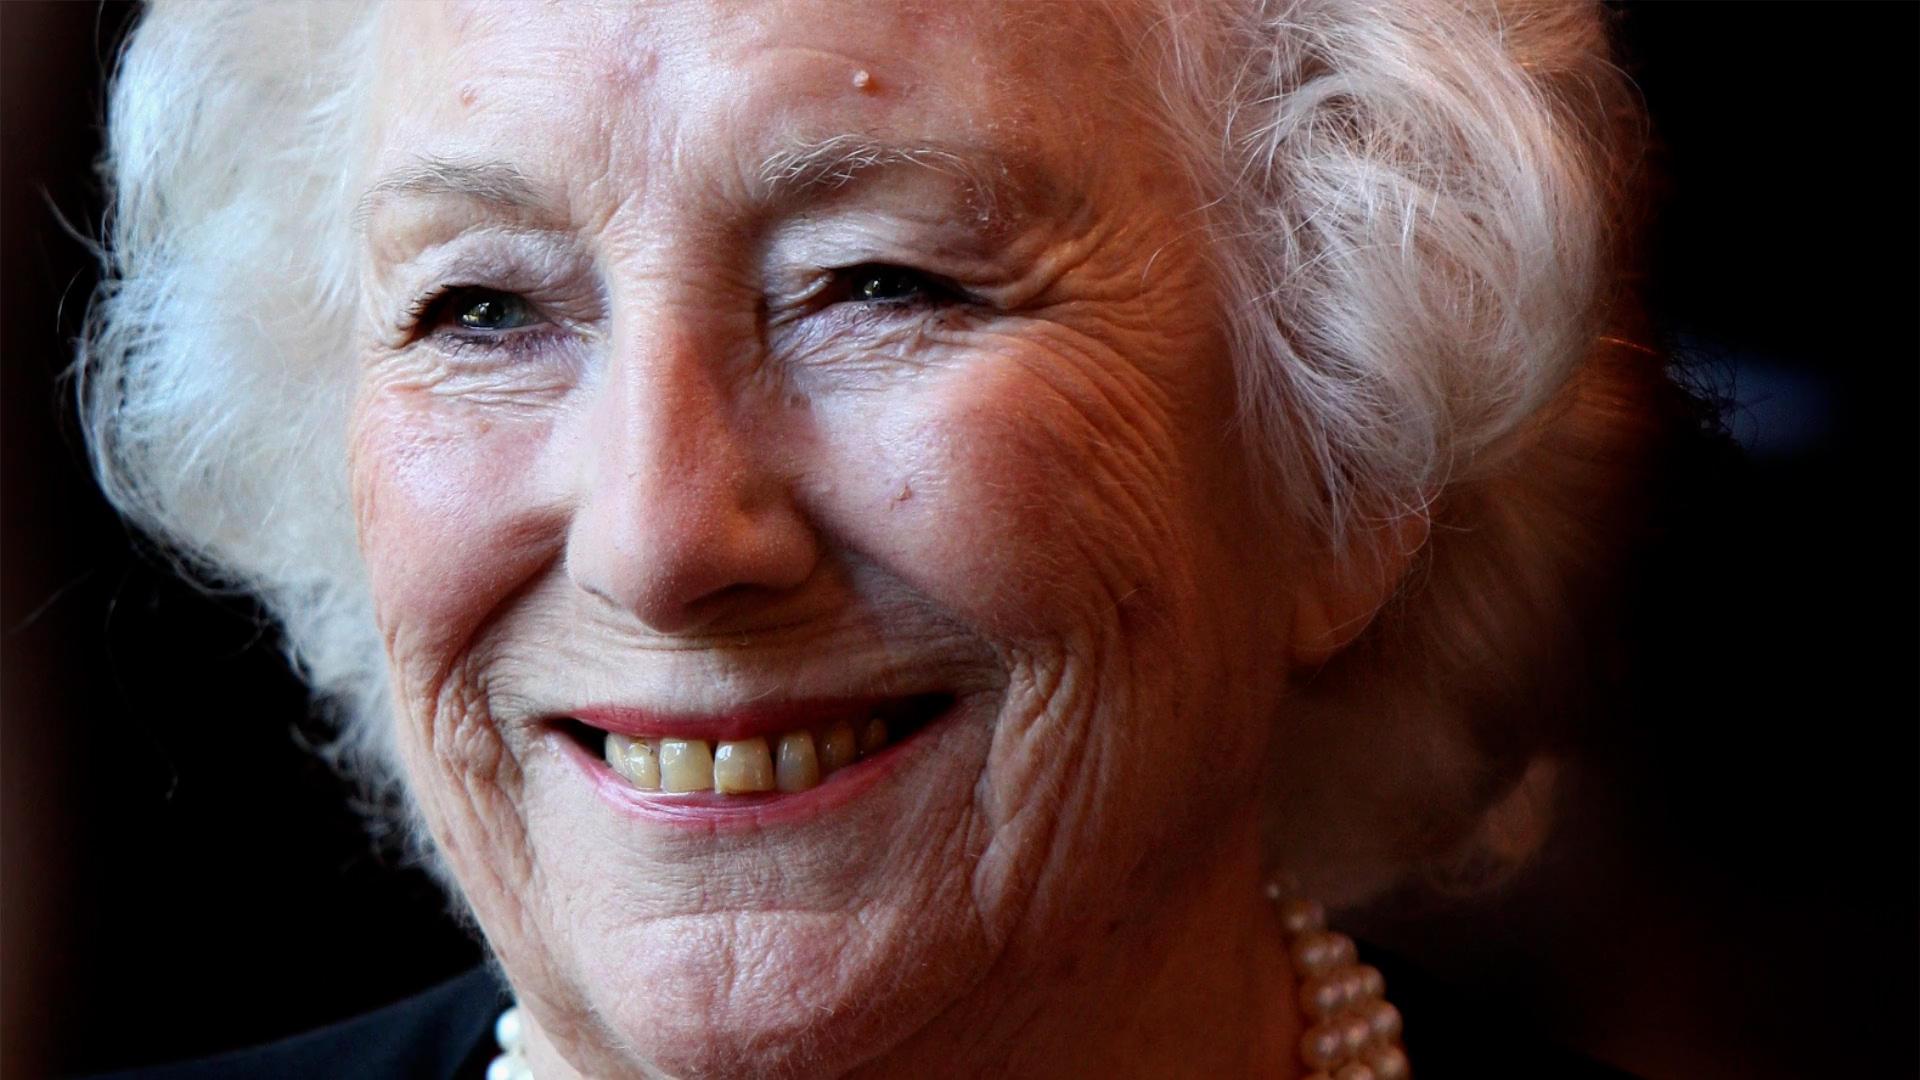 BREAKING NEWS: Dame Vera Lynn dies aged 103